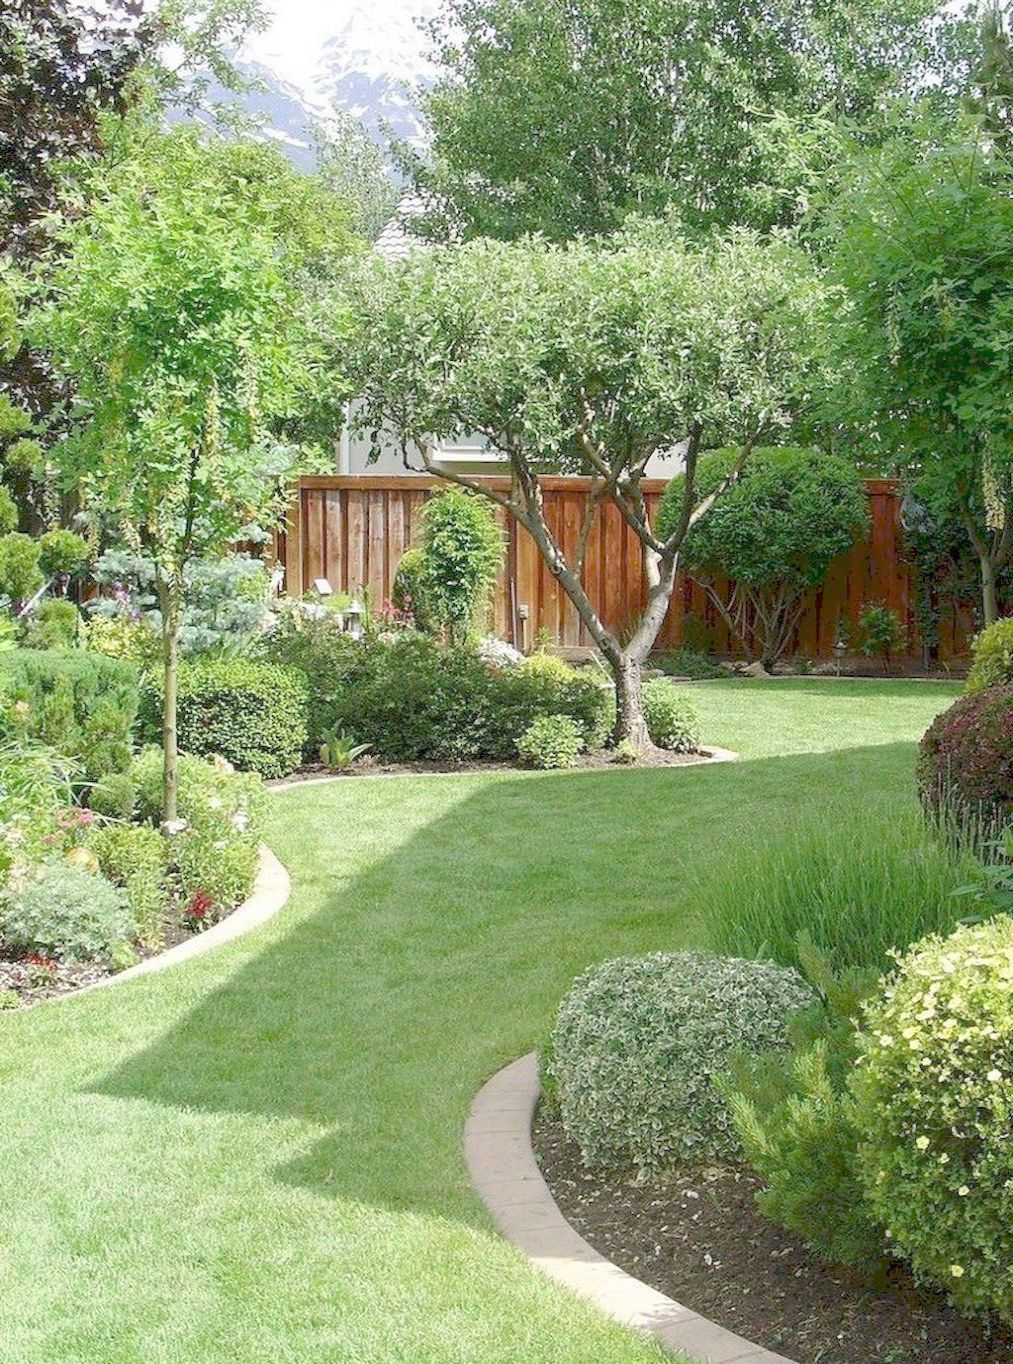 Landscape Gardening Course Sussex Except Landscape Gardening Manchester Such Abstract Small Backyard Landscaping Small Backyard Gardens Garden Landscape Design